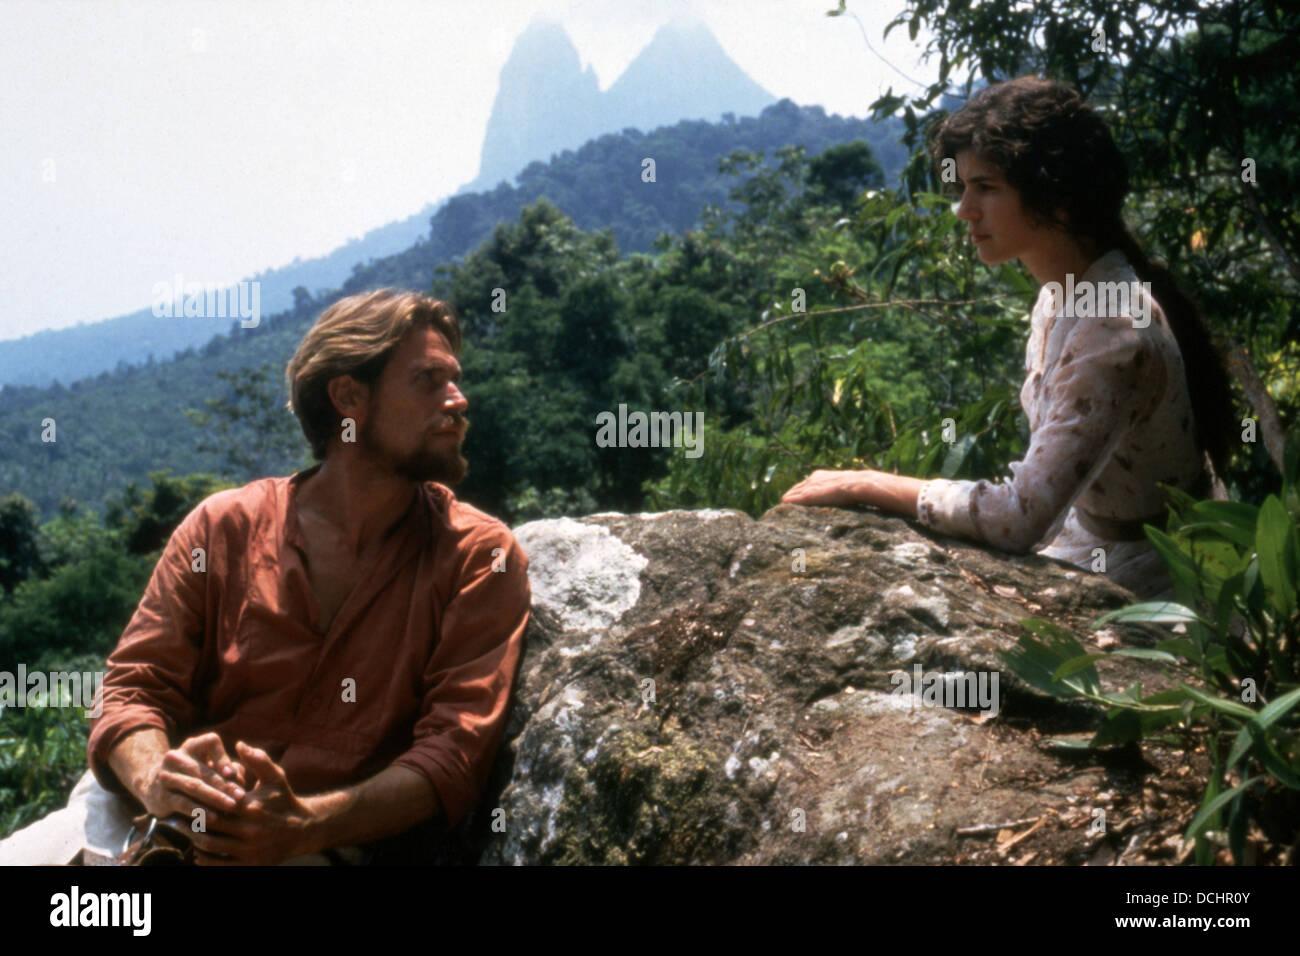 Victoria (1996) fuga para o amor (alt), Willem Dafoe, Irene Jacobs, mark peploe (dir) colección moviestore Imagen De Stock